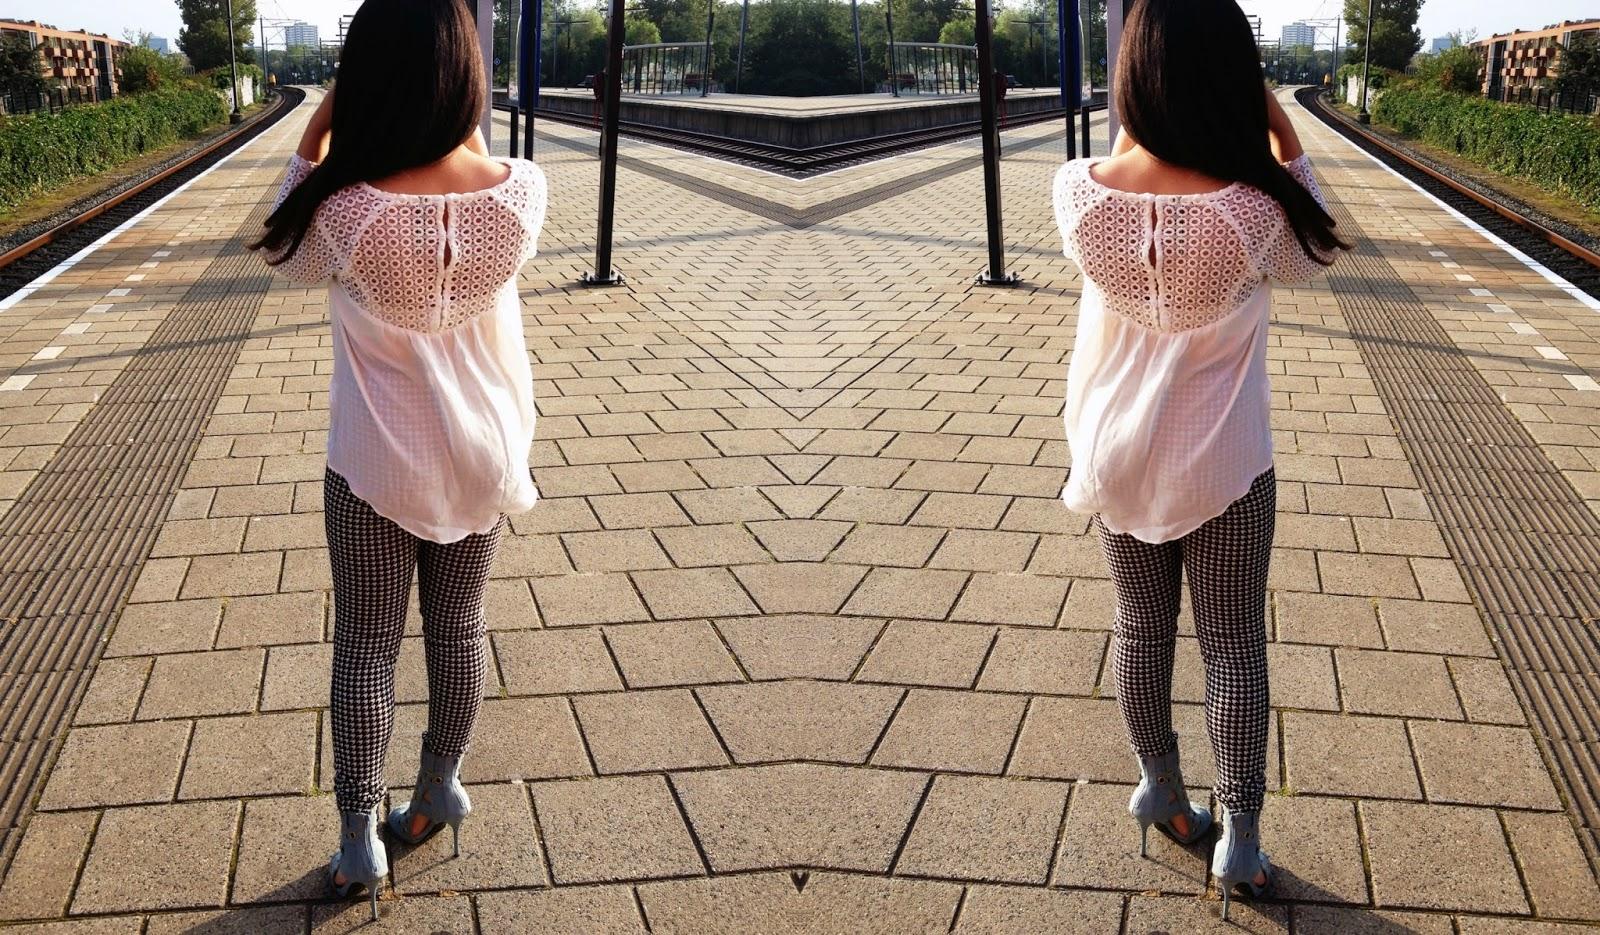 Twinkeltje.nl white button blouse review